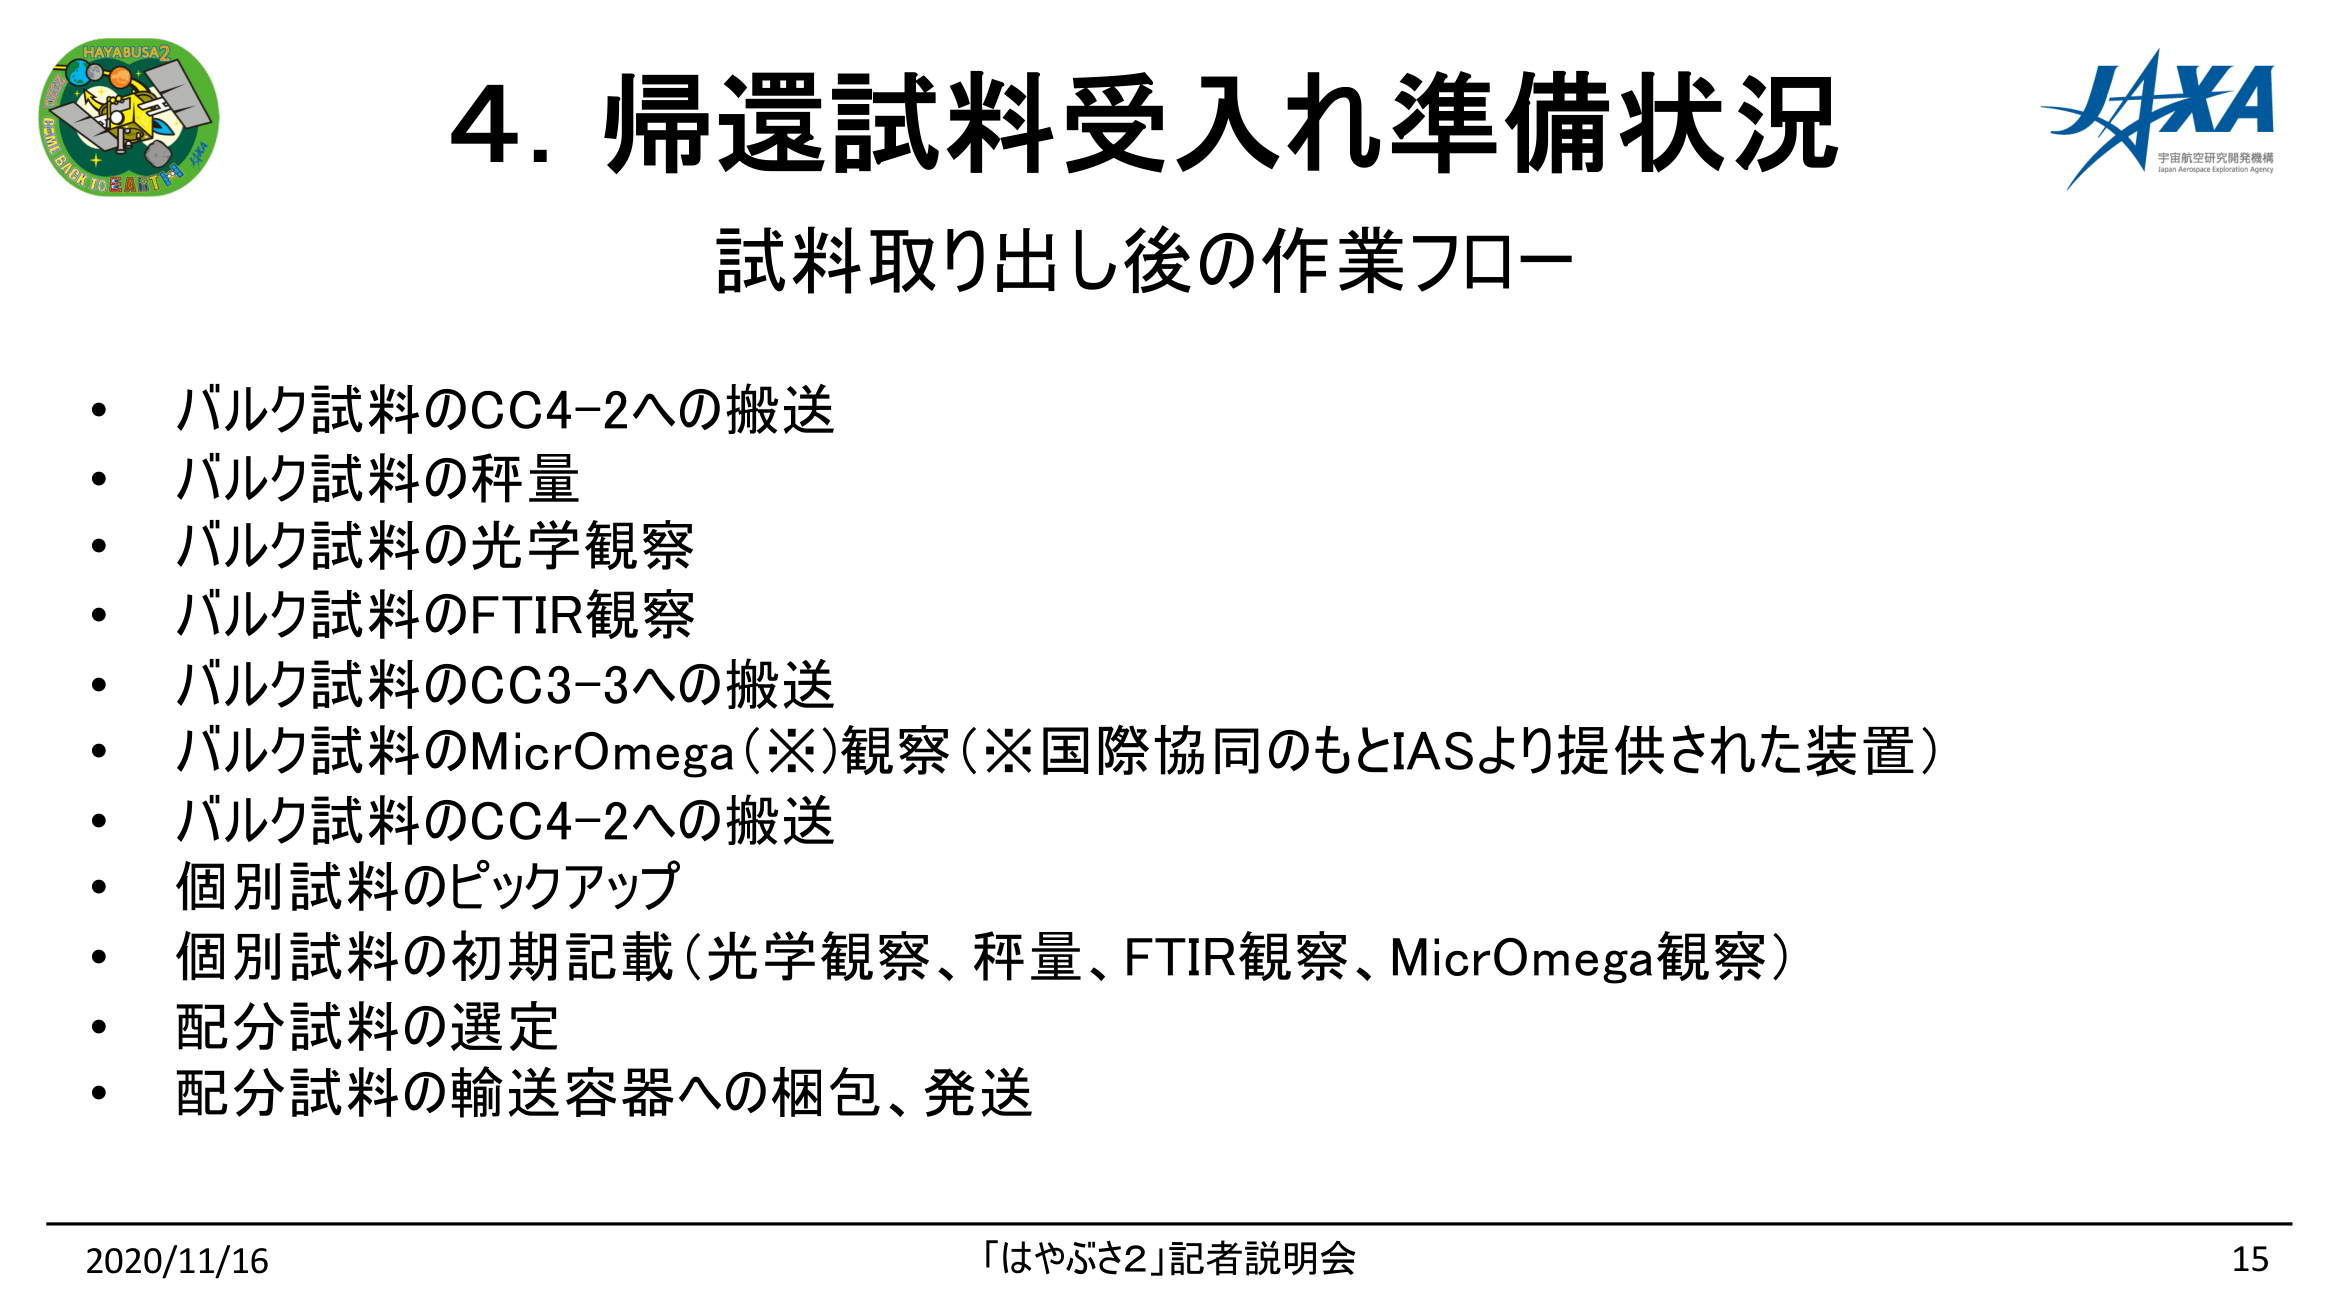 f:id:Imamura:20201116151256p:plain